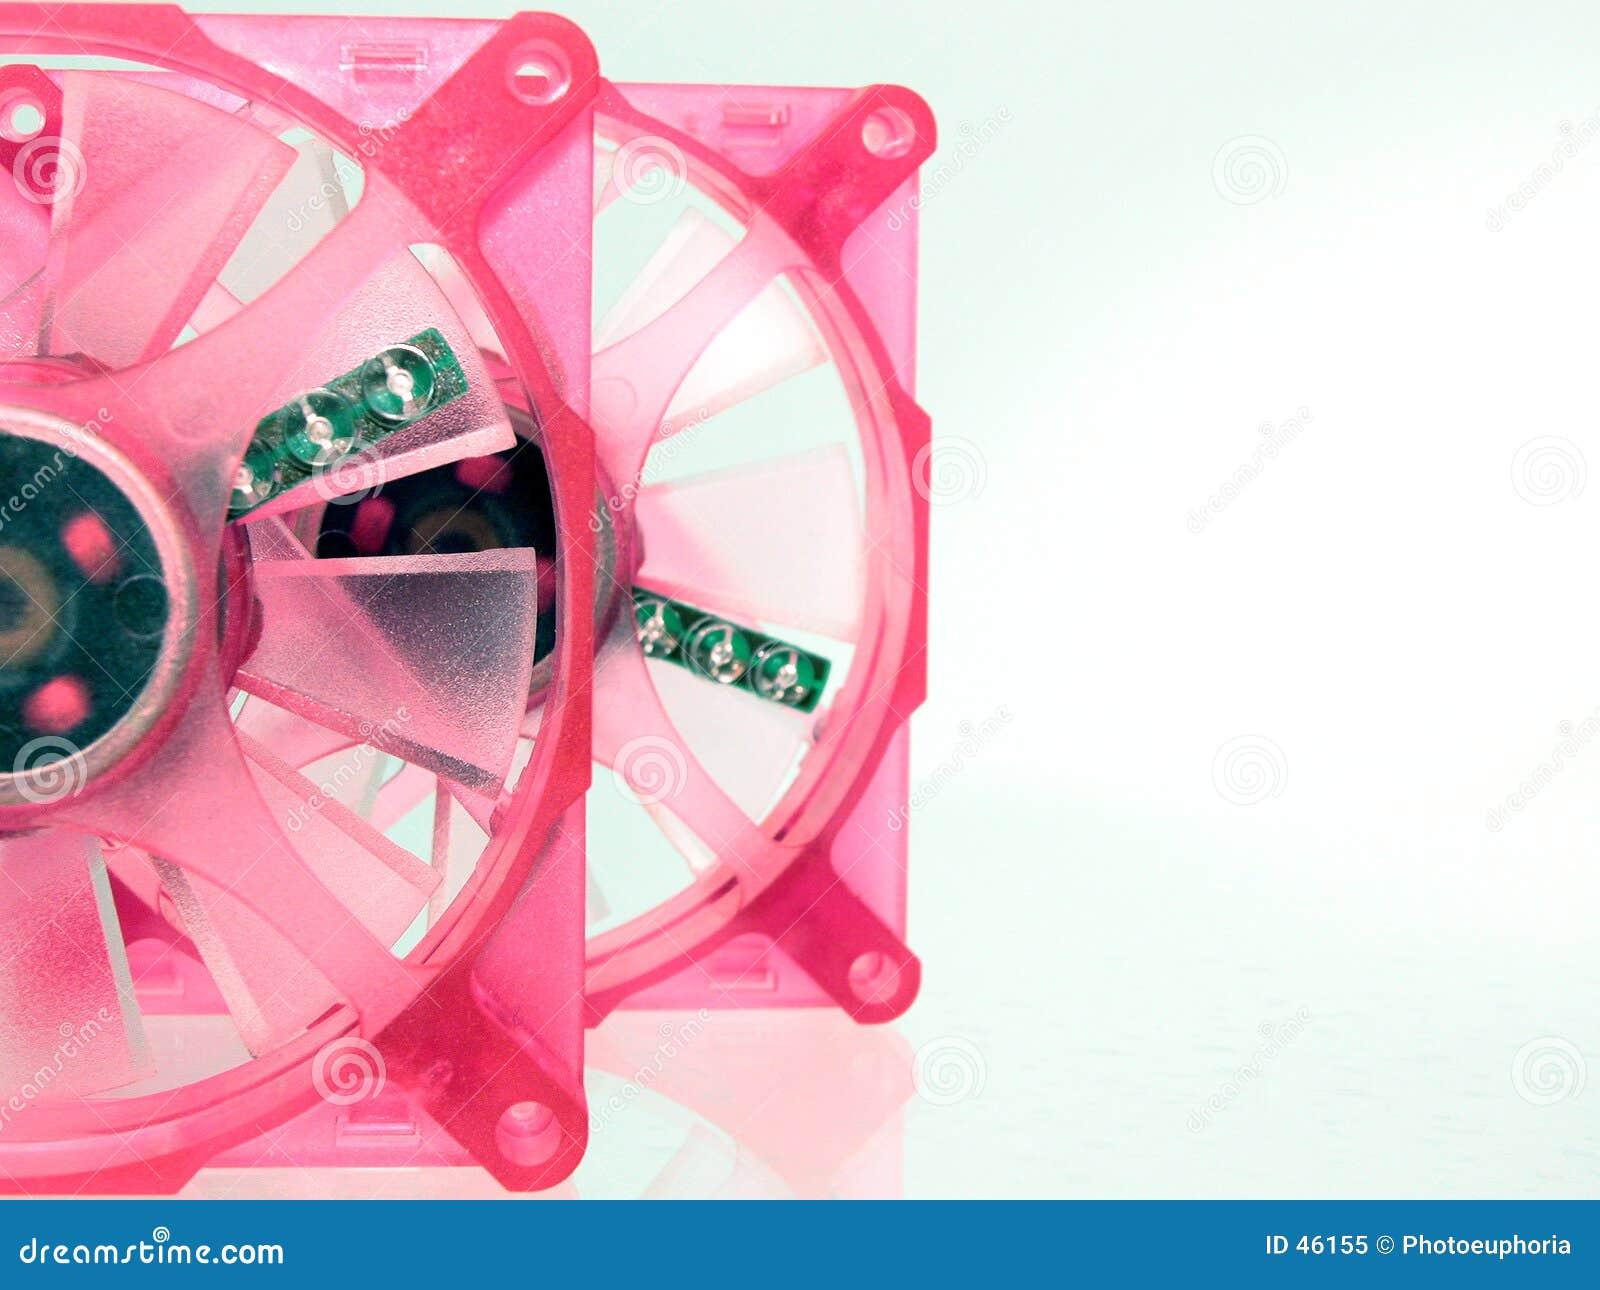 Fall lockert recht im Rosa auf